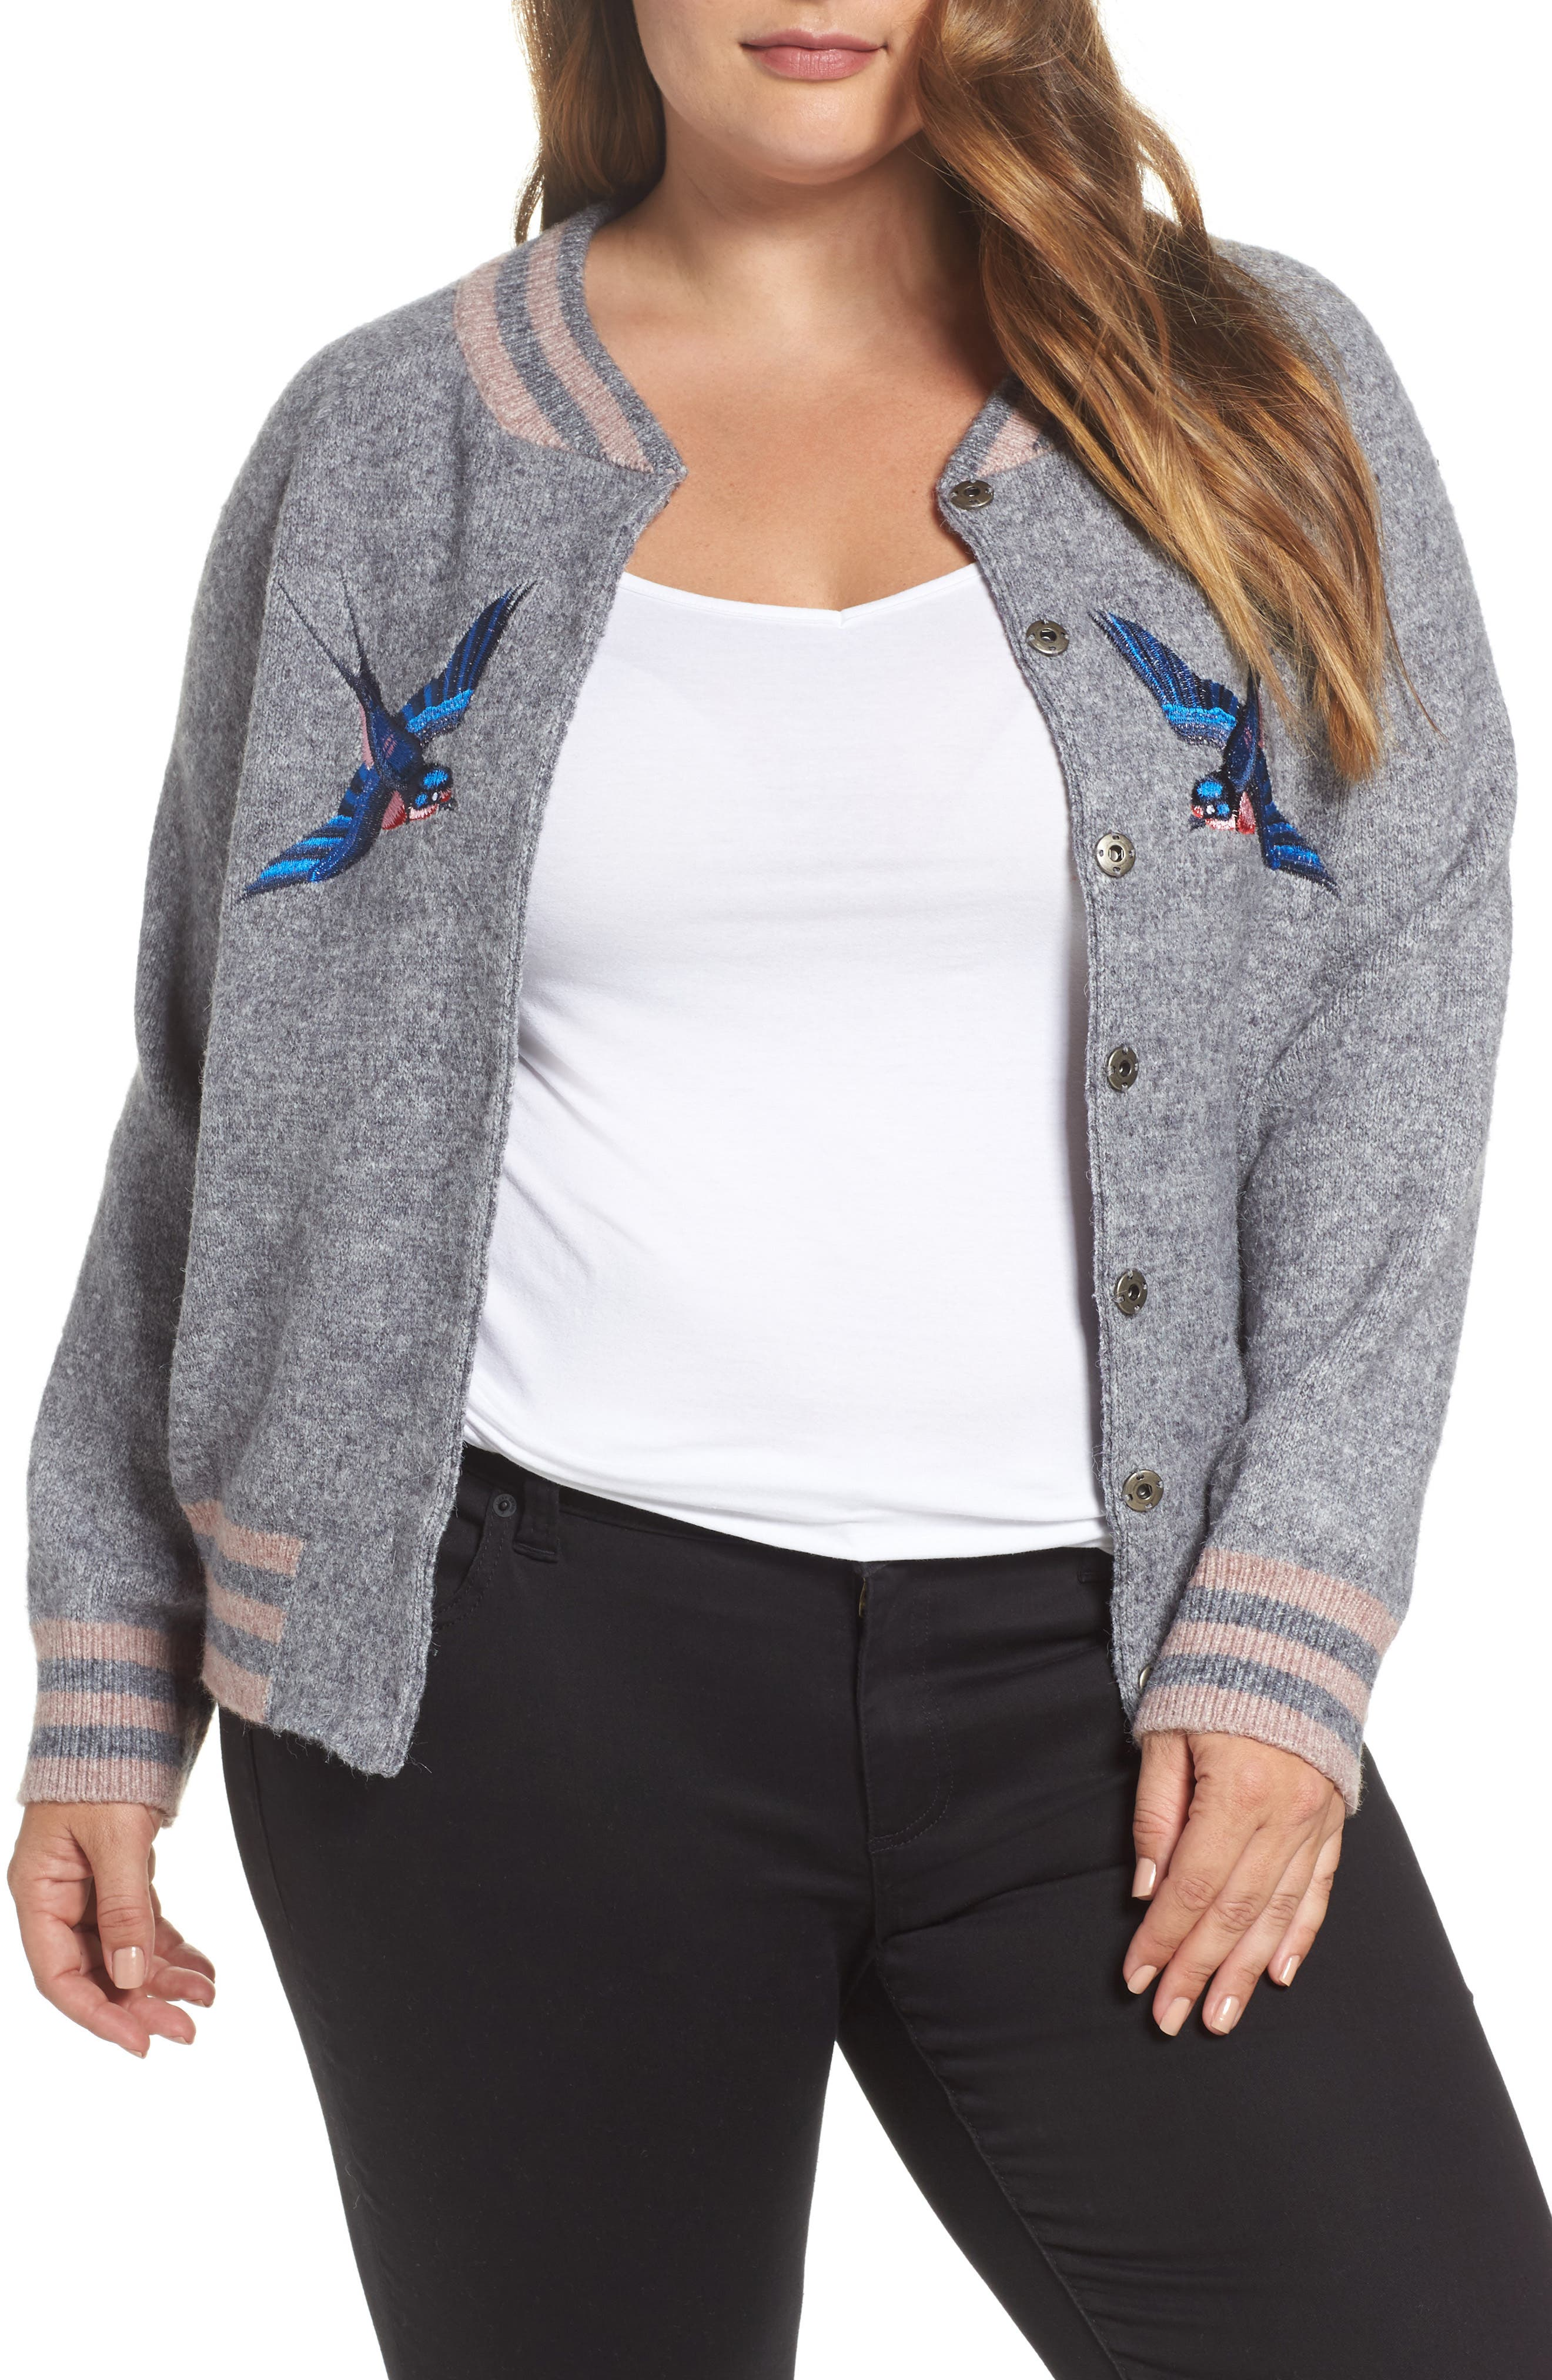 Zanja Embroidered Knit Bomber Jacket,                         Main,                         color, 034